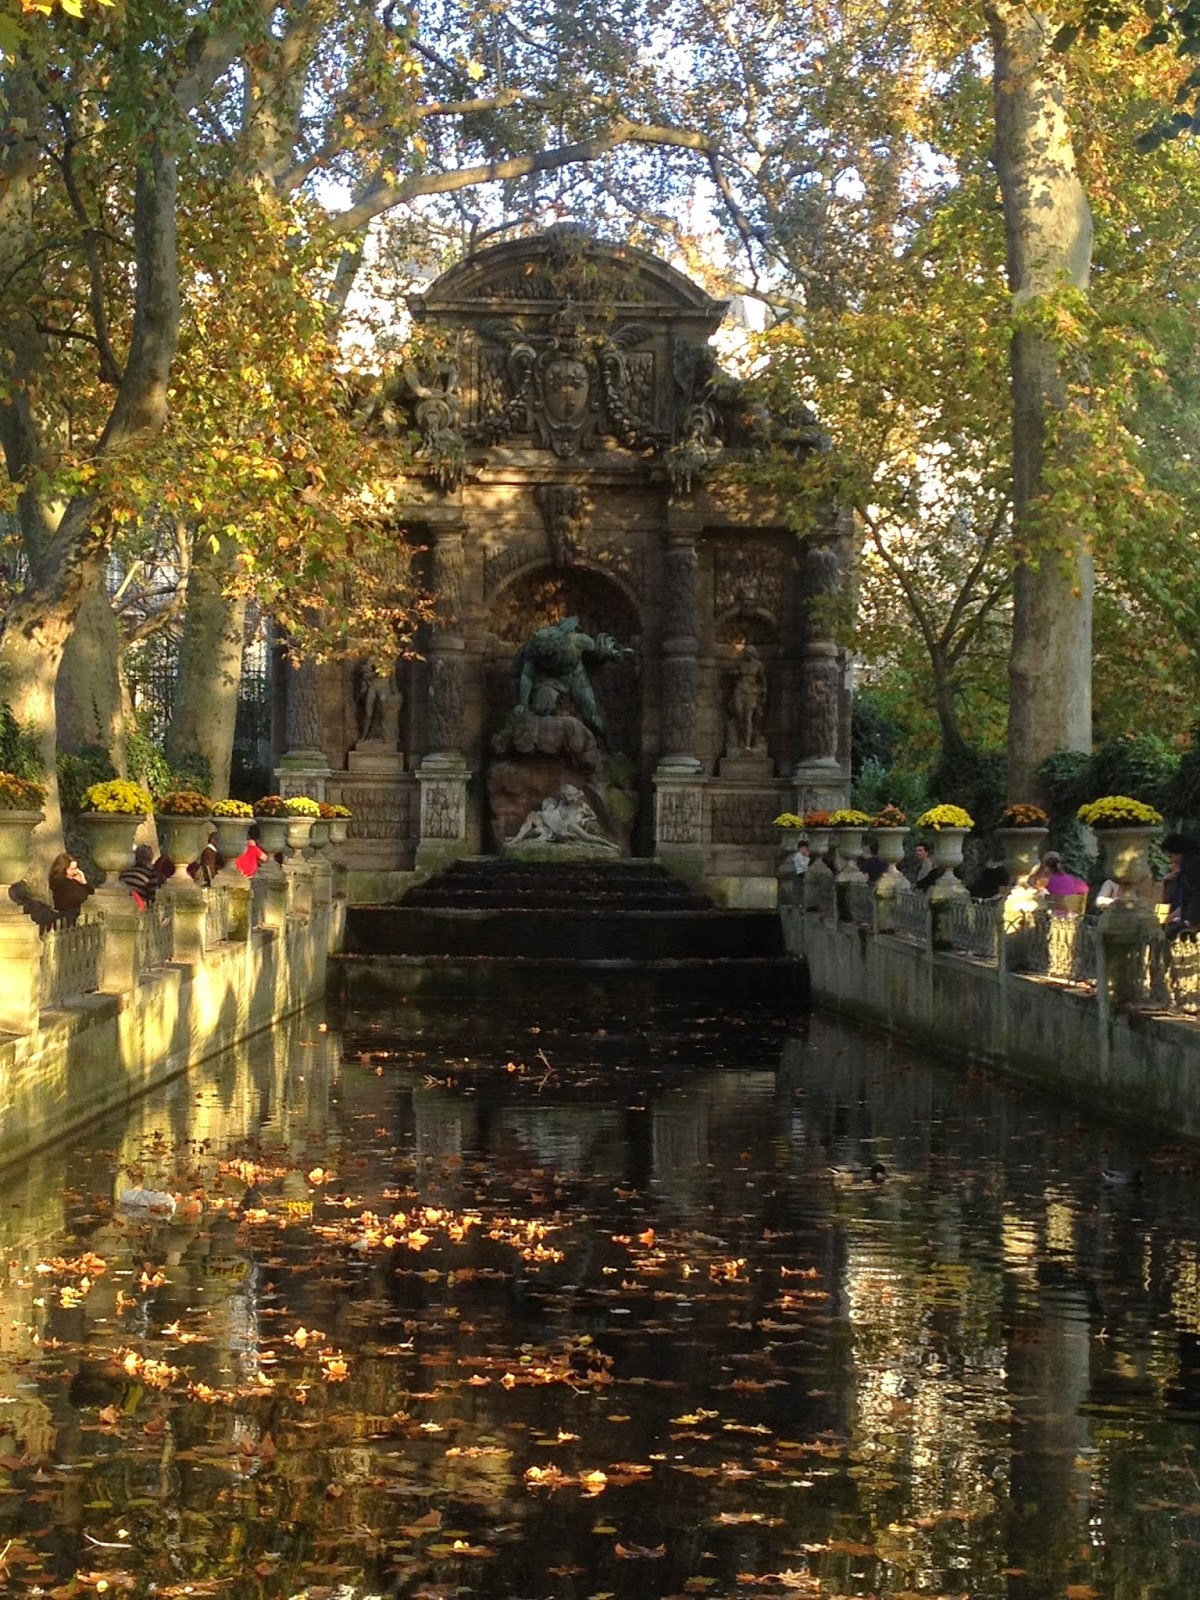 La fontaine Médicis, Jardin du Luxembourg, Paris